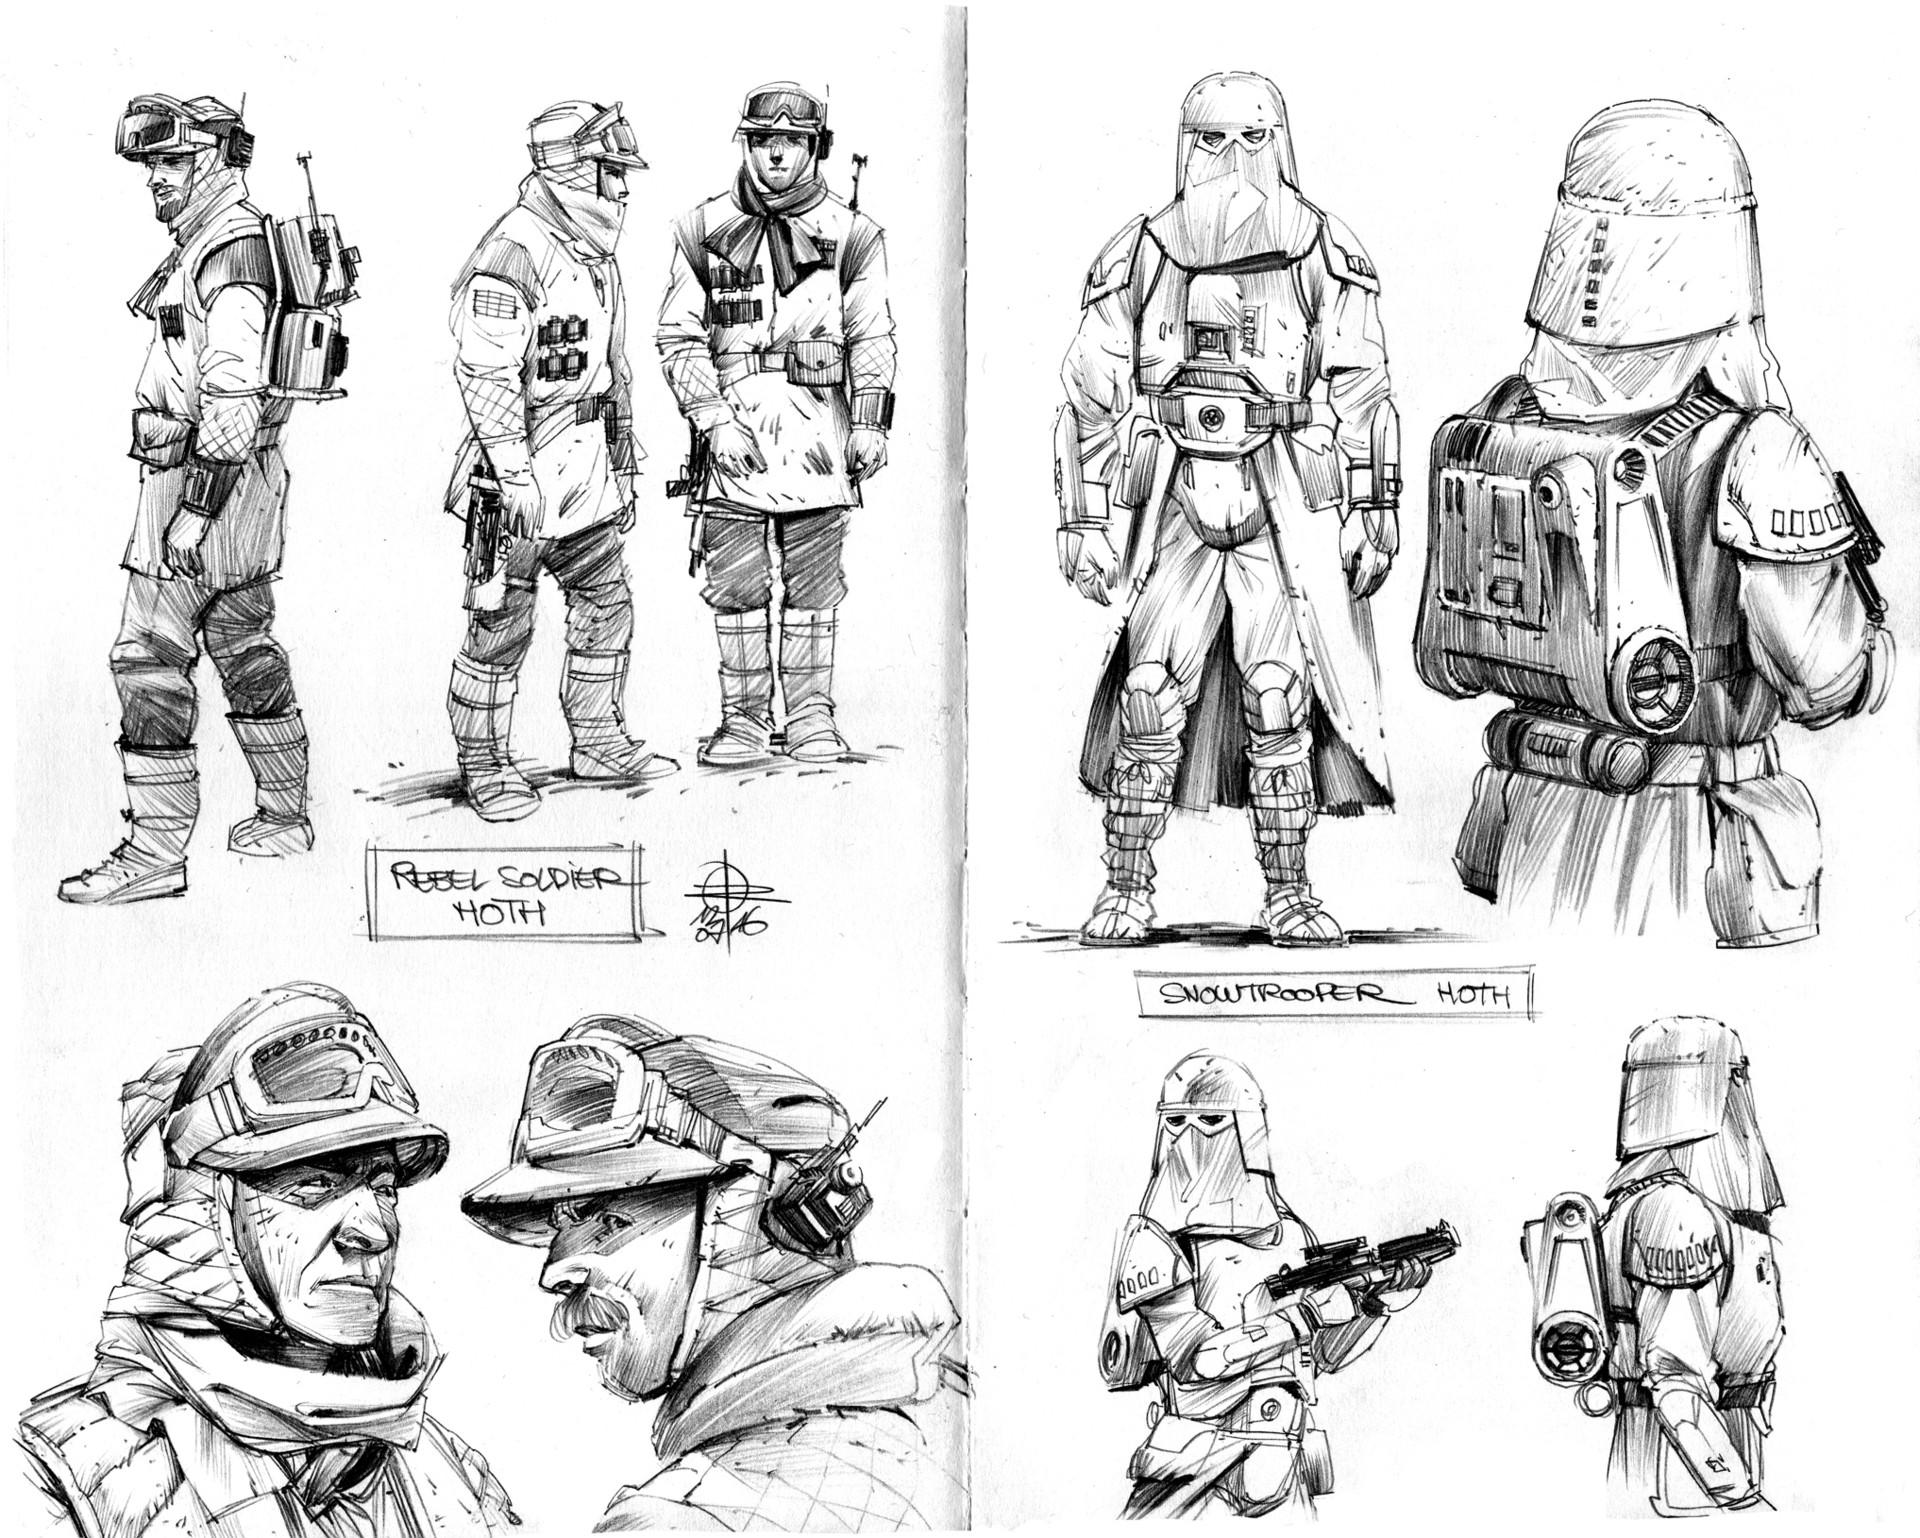 Renaud roche part01 sketches01b